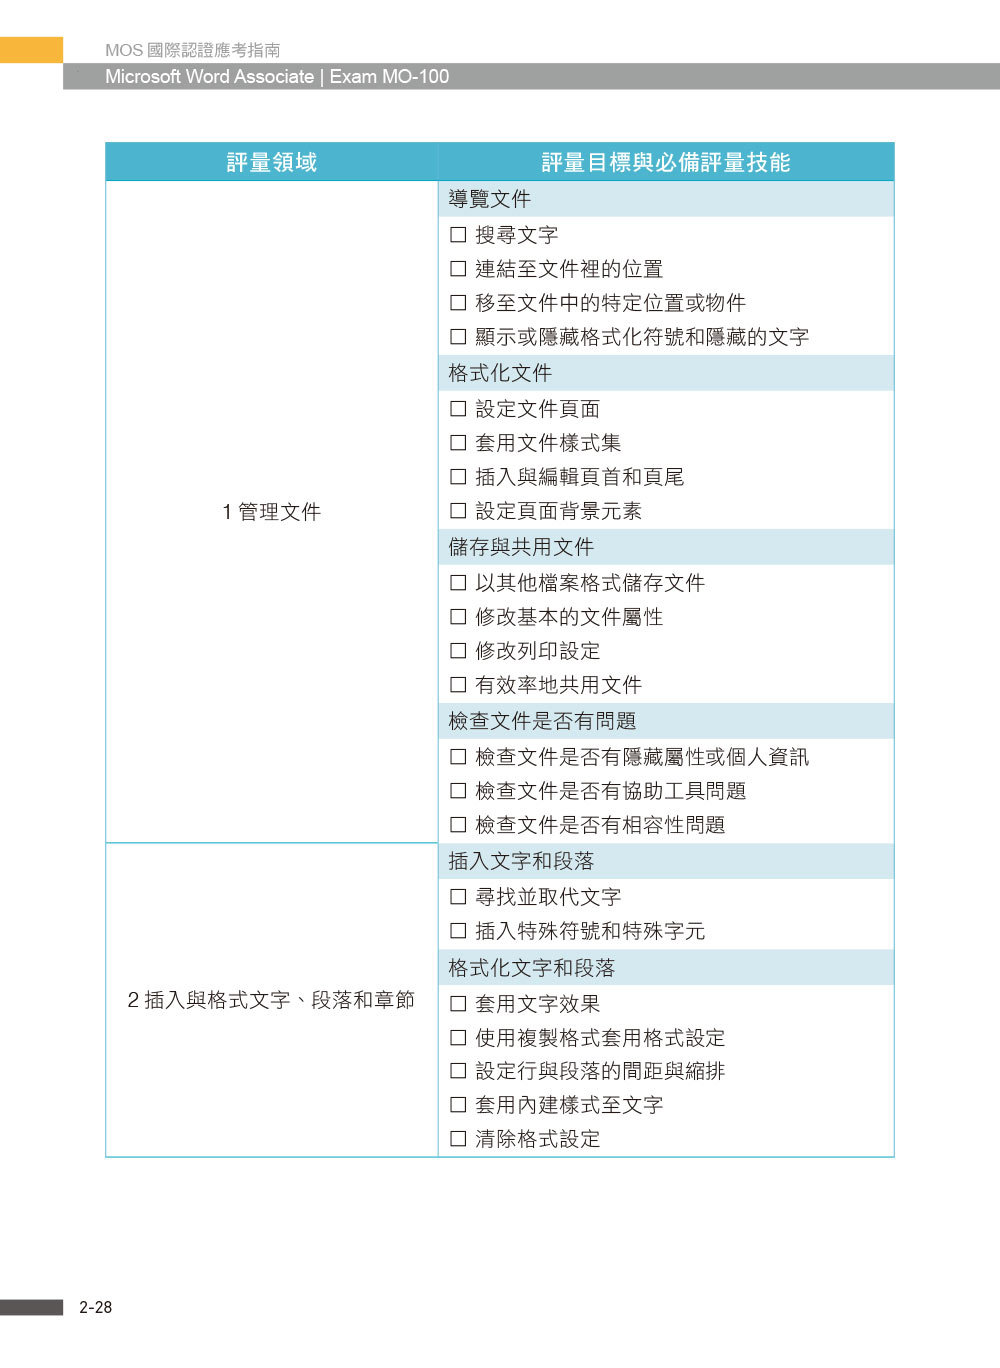 MOS 國際認證應考指南 -- Microsoft Word Associate|Exam MO-100-preview-3